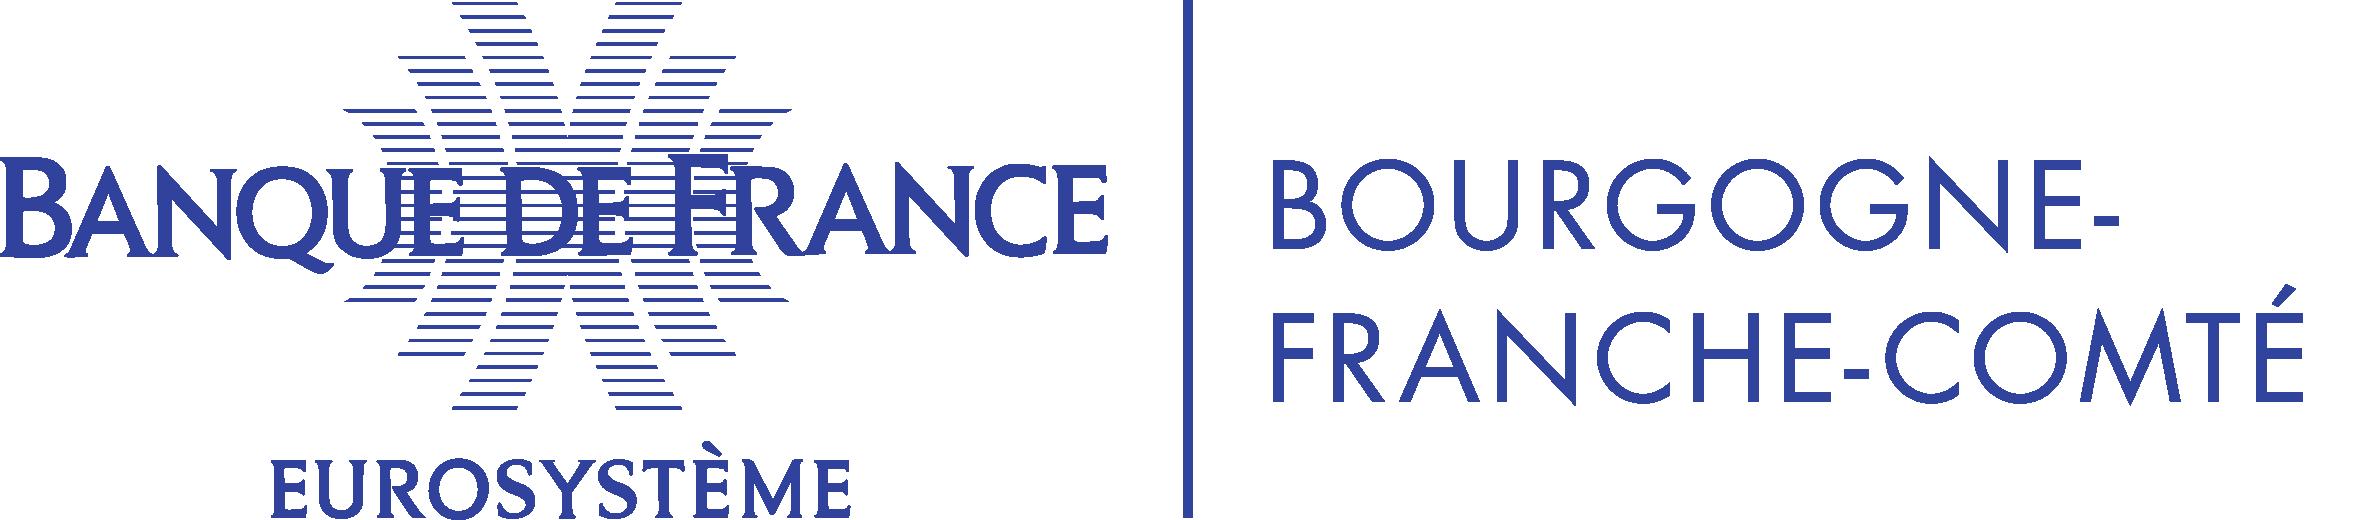 Permanence Banque de France